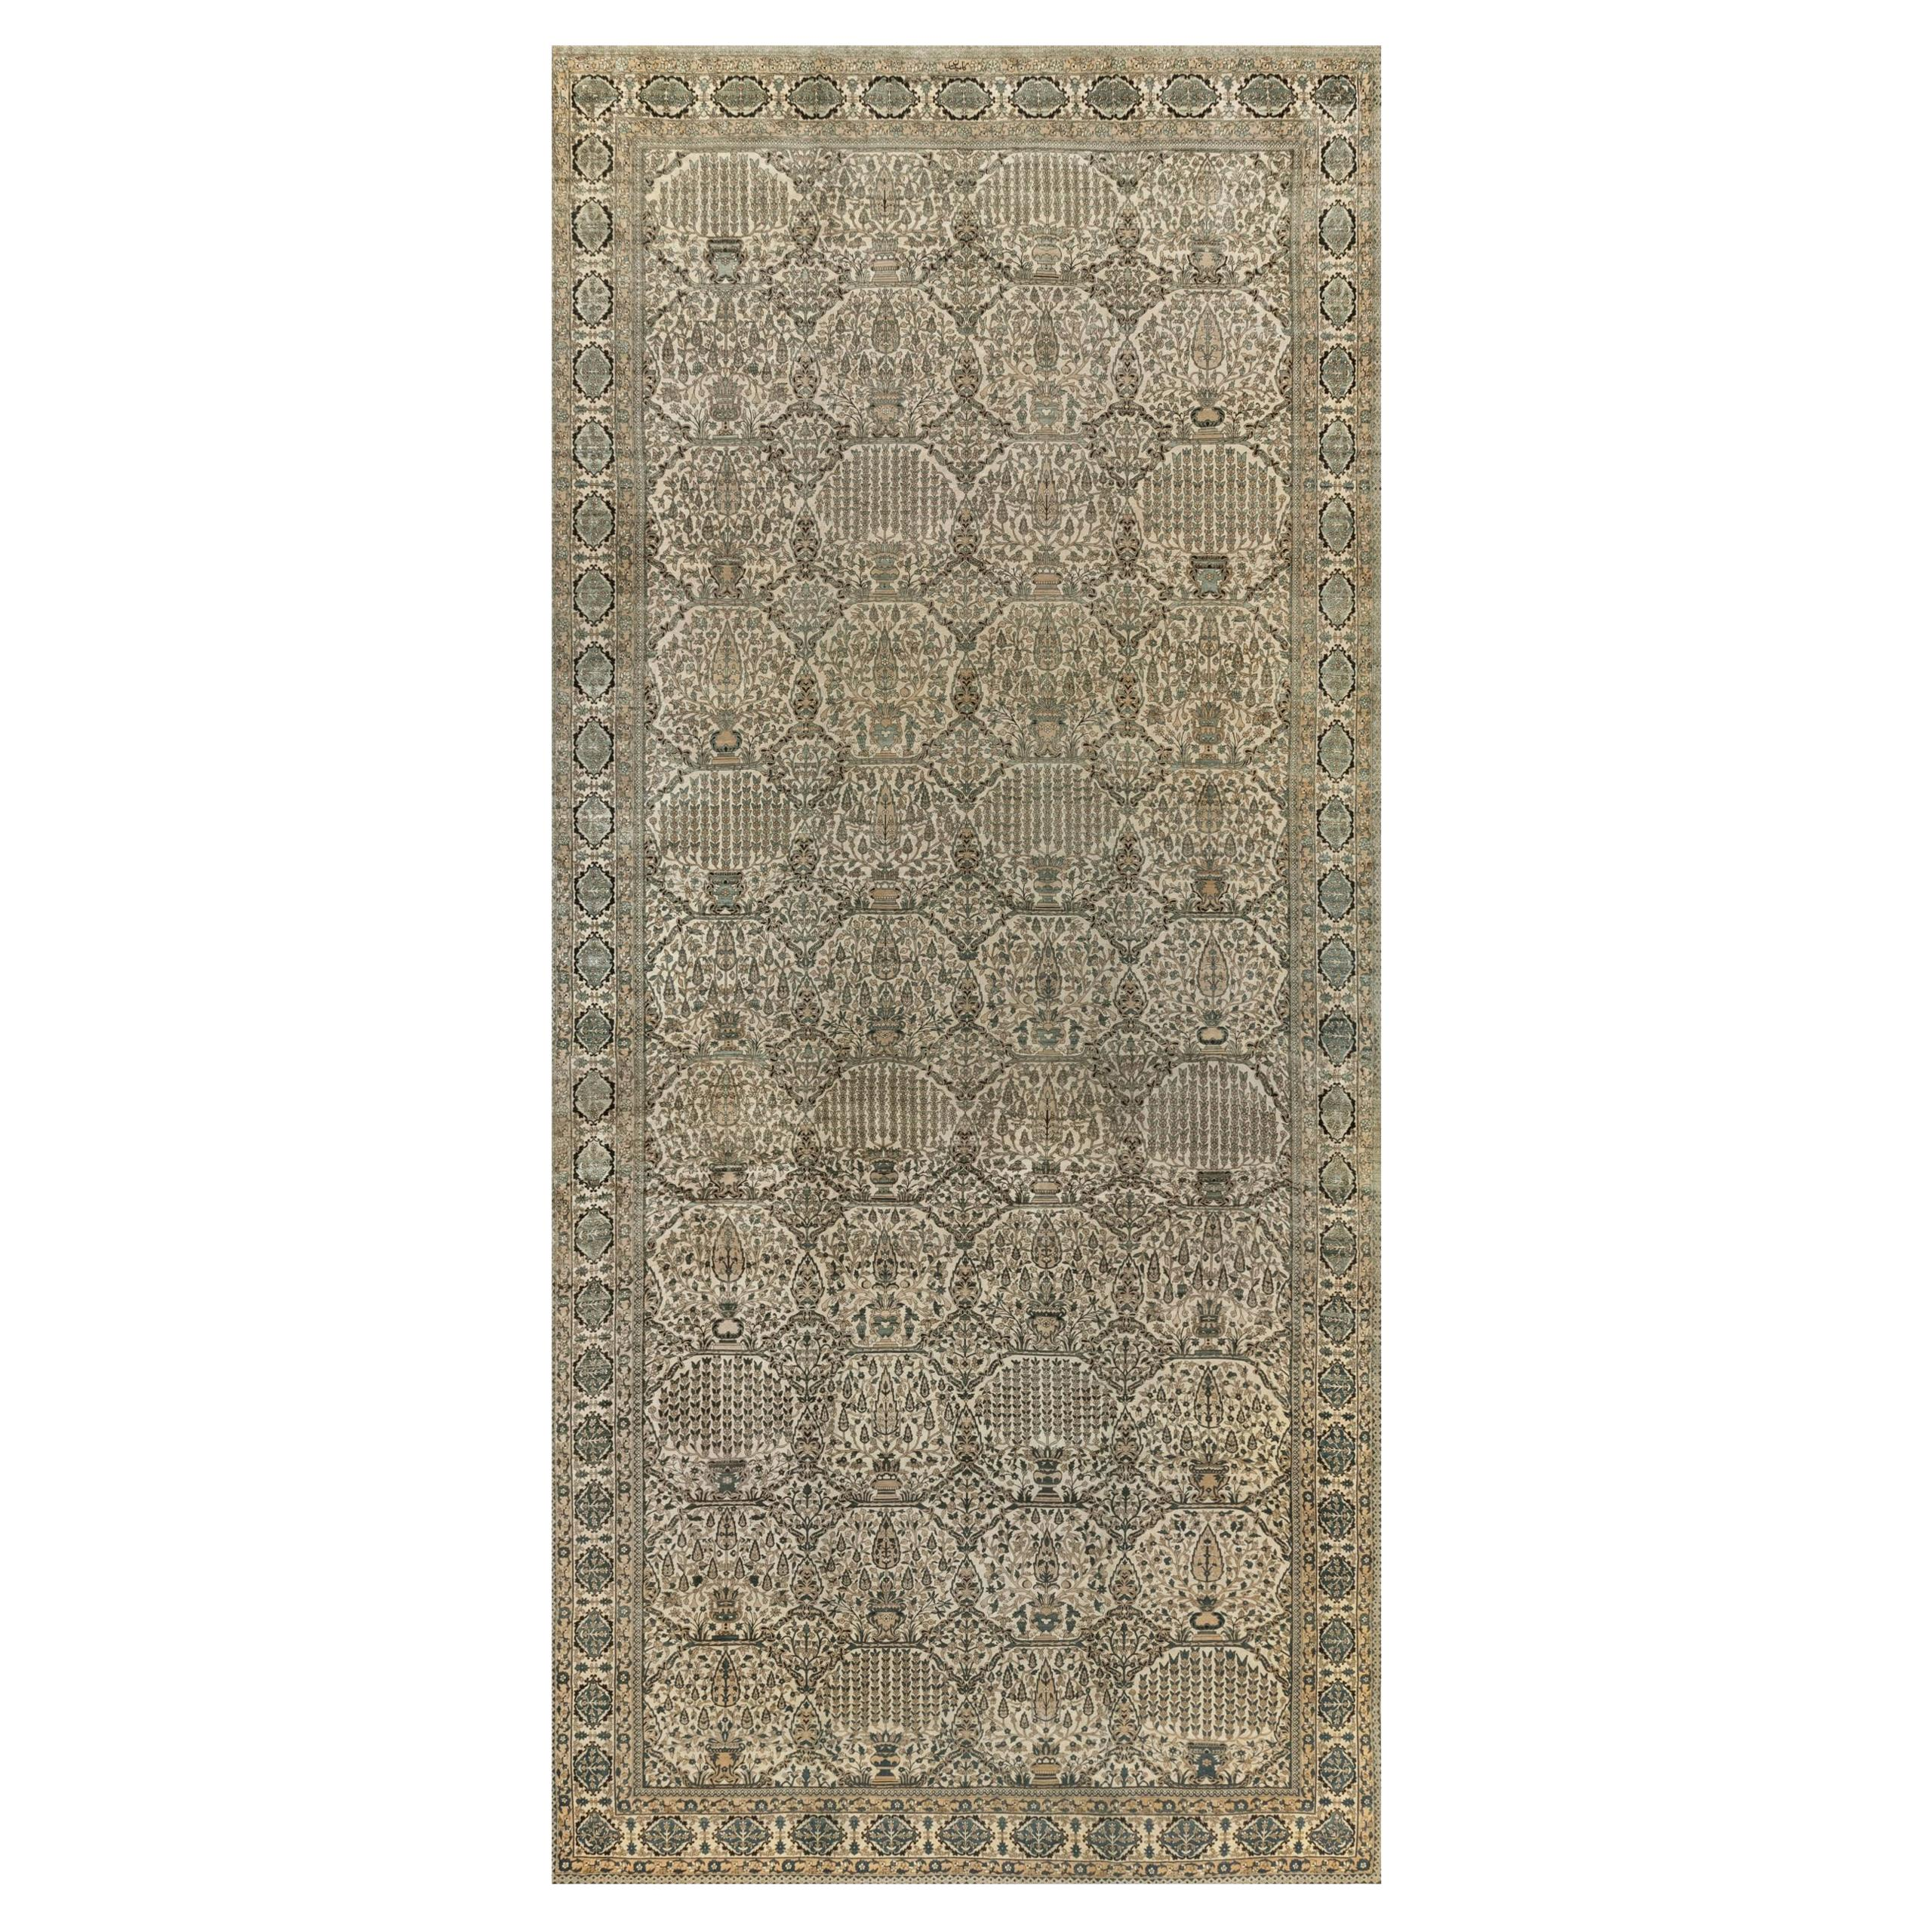 Antique Persian Kirman Handwoven Wool Rug